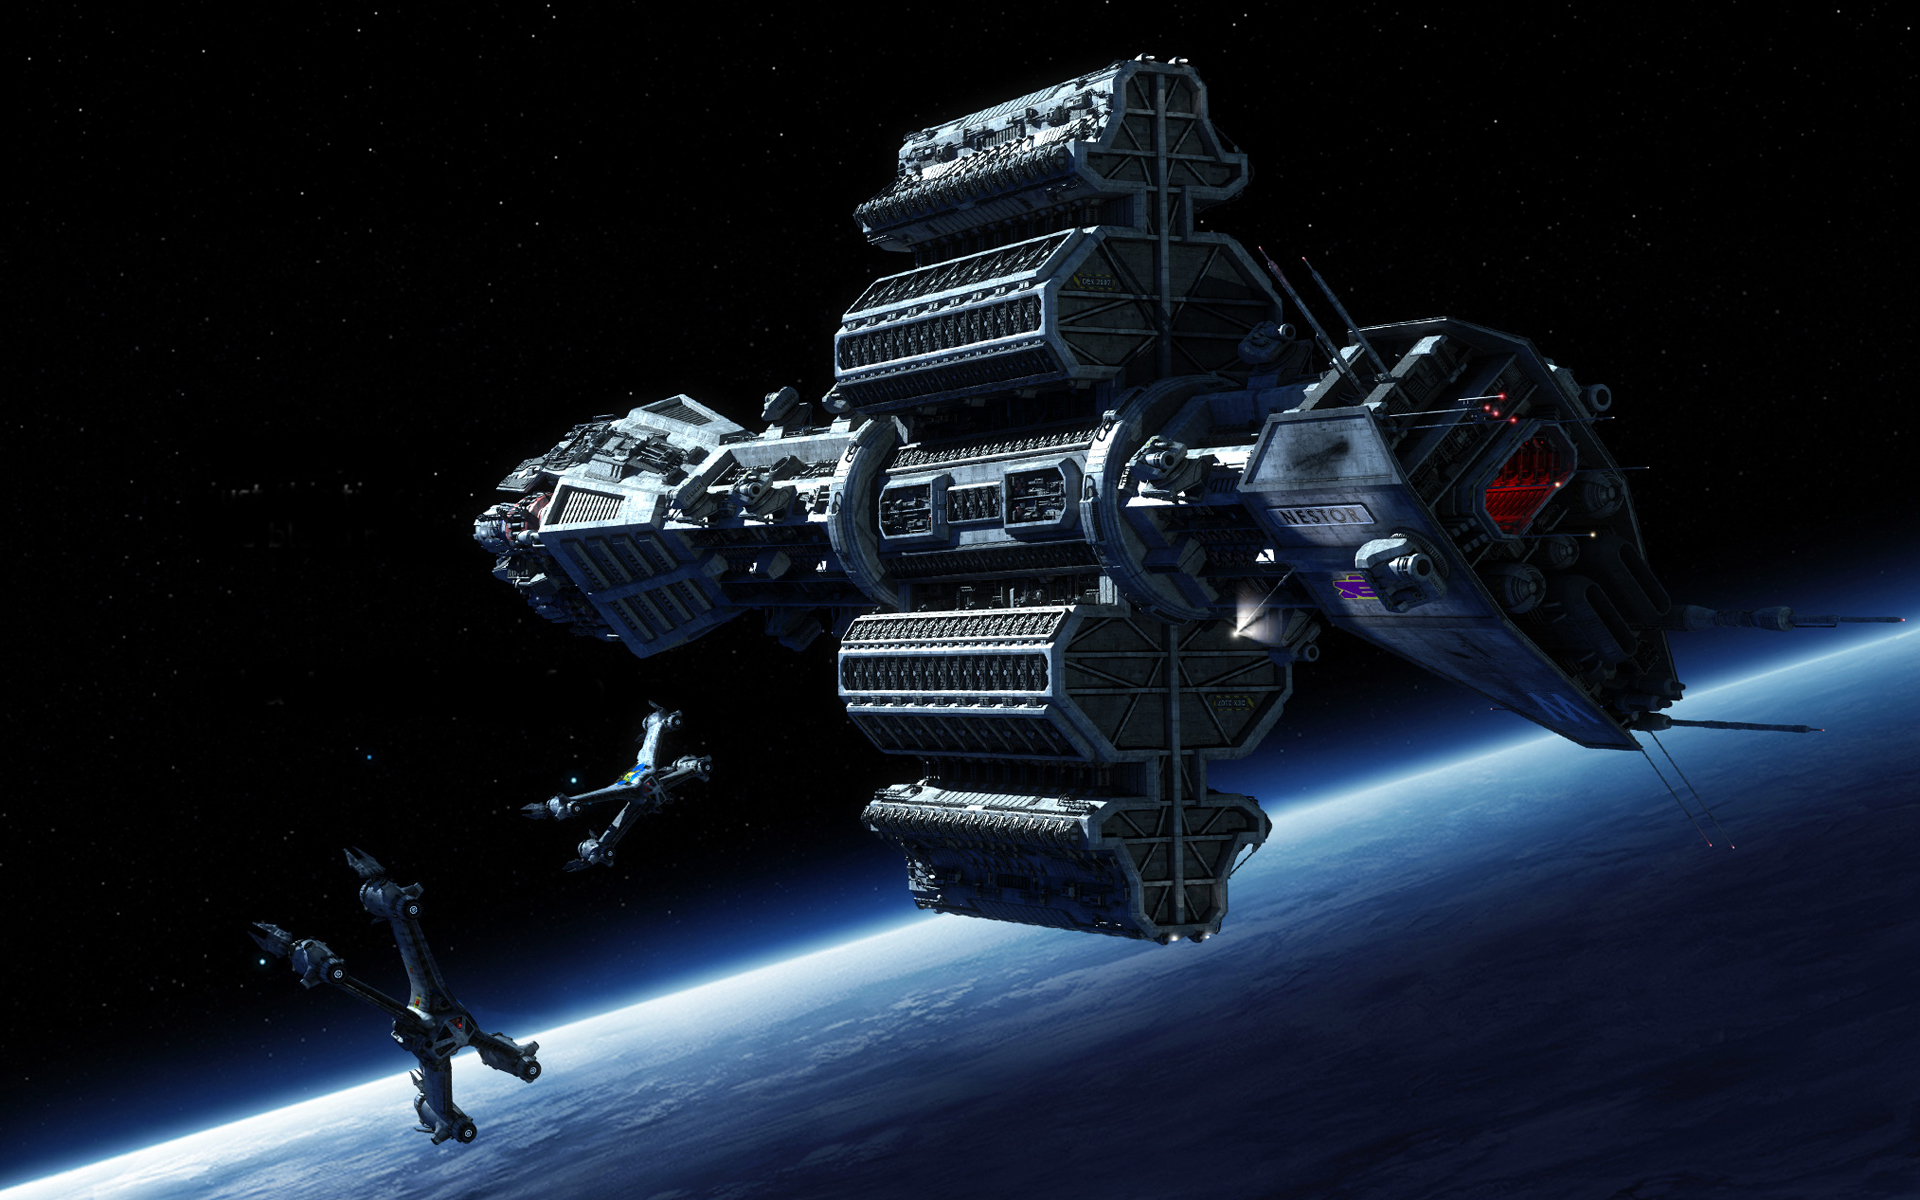 HQ Babylon 5 Wallpapers | File 1016.05Kb